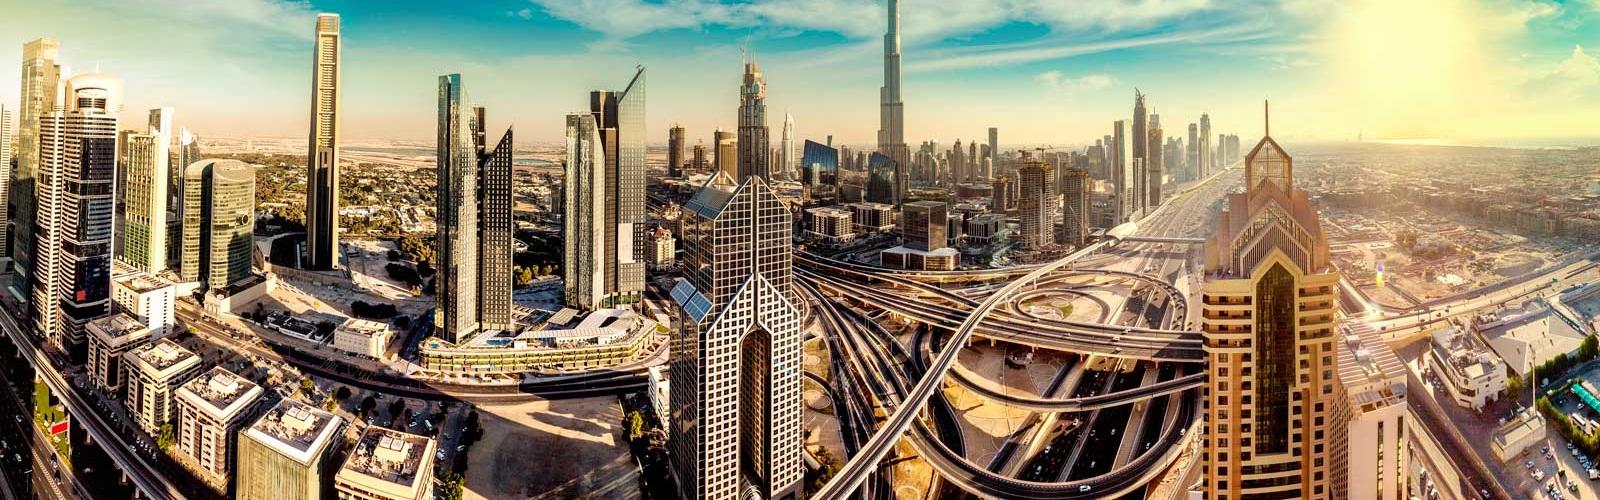 klm-art Дубае